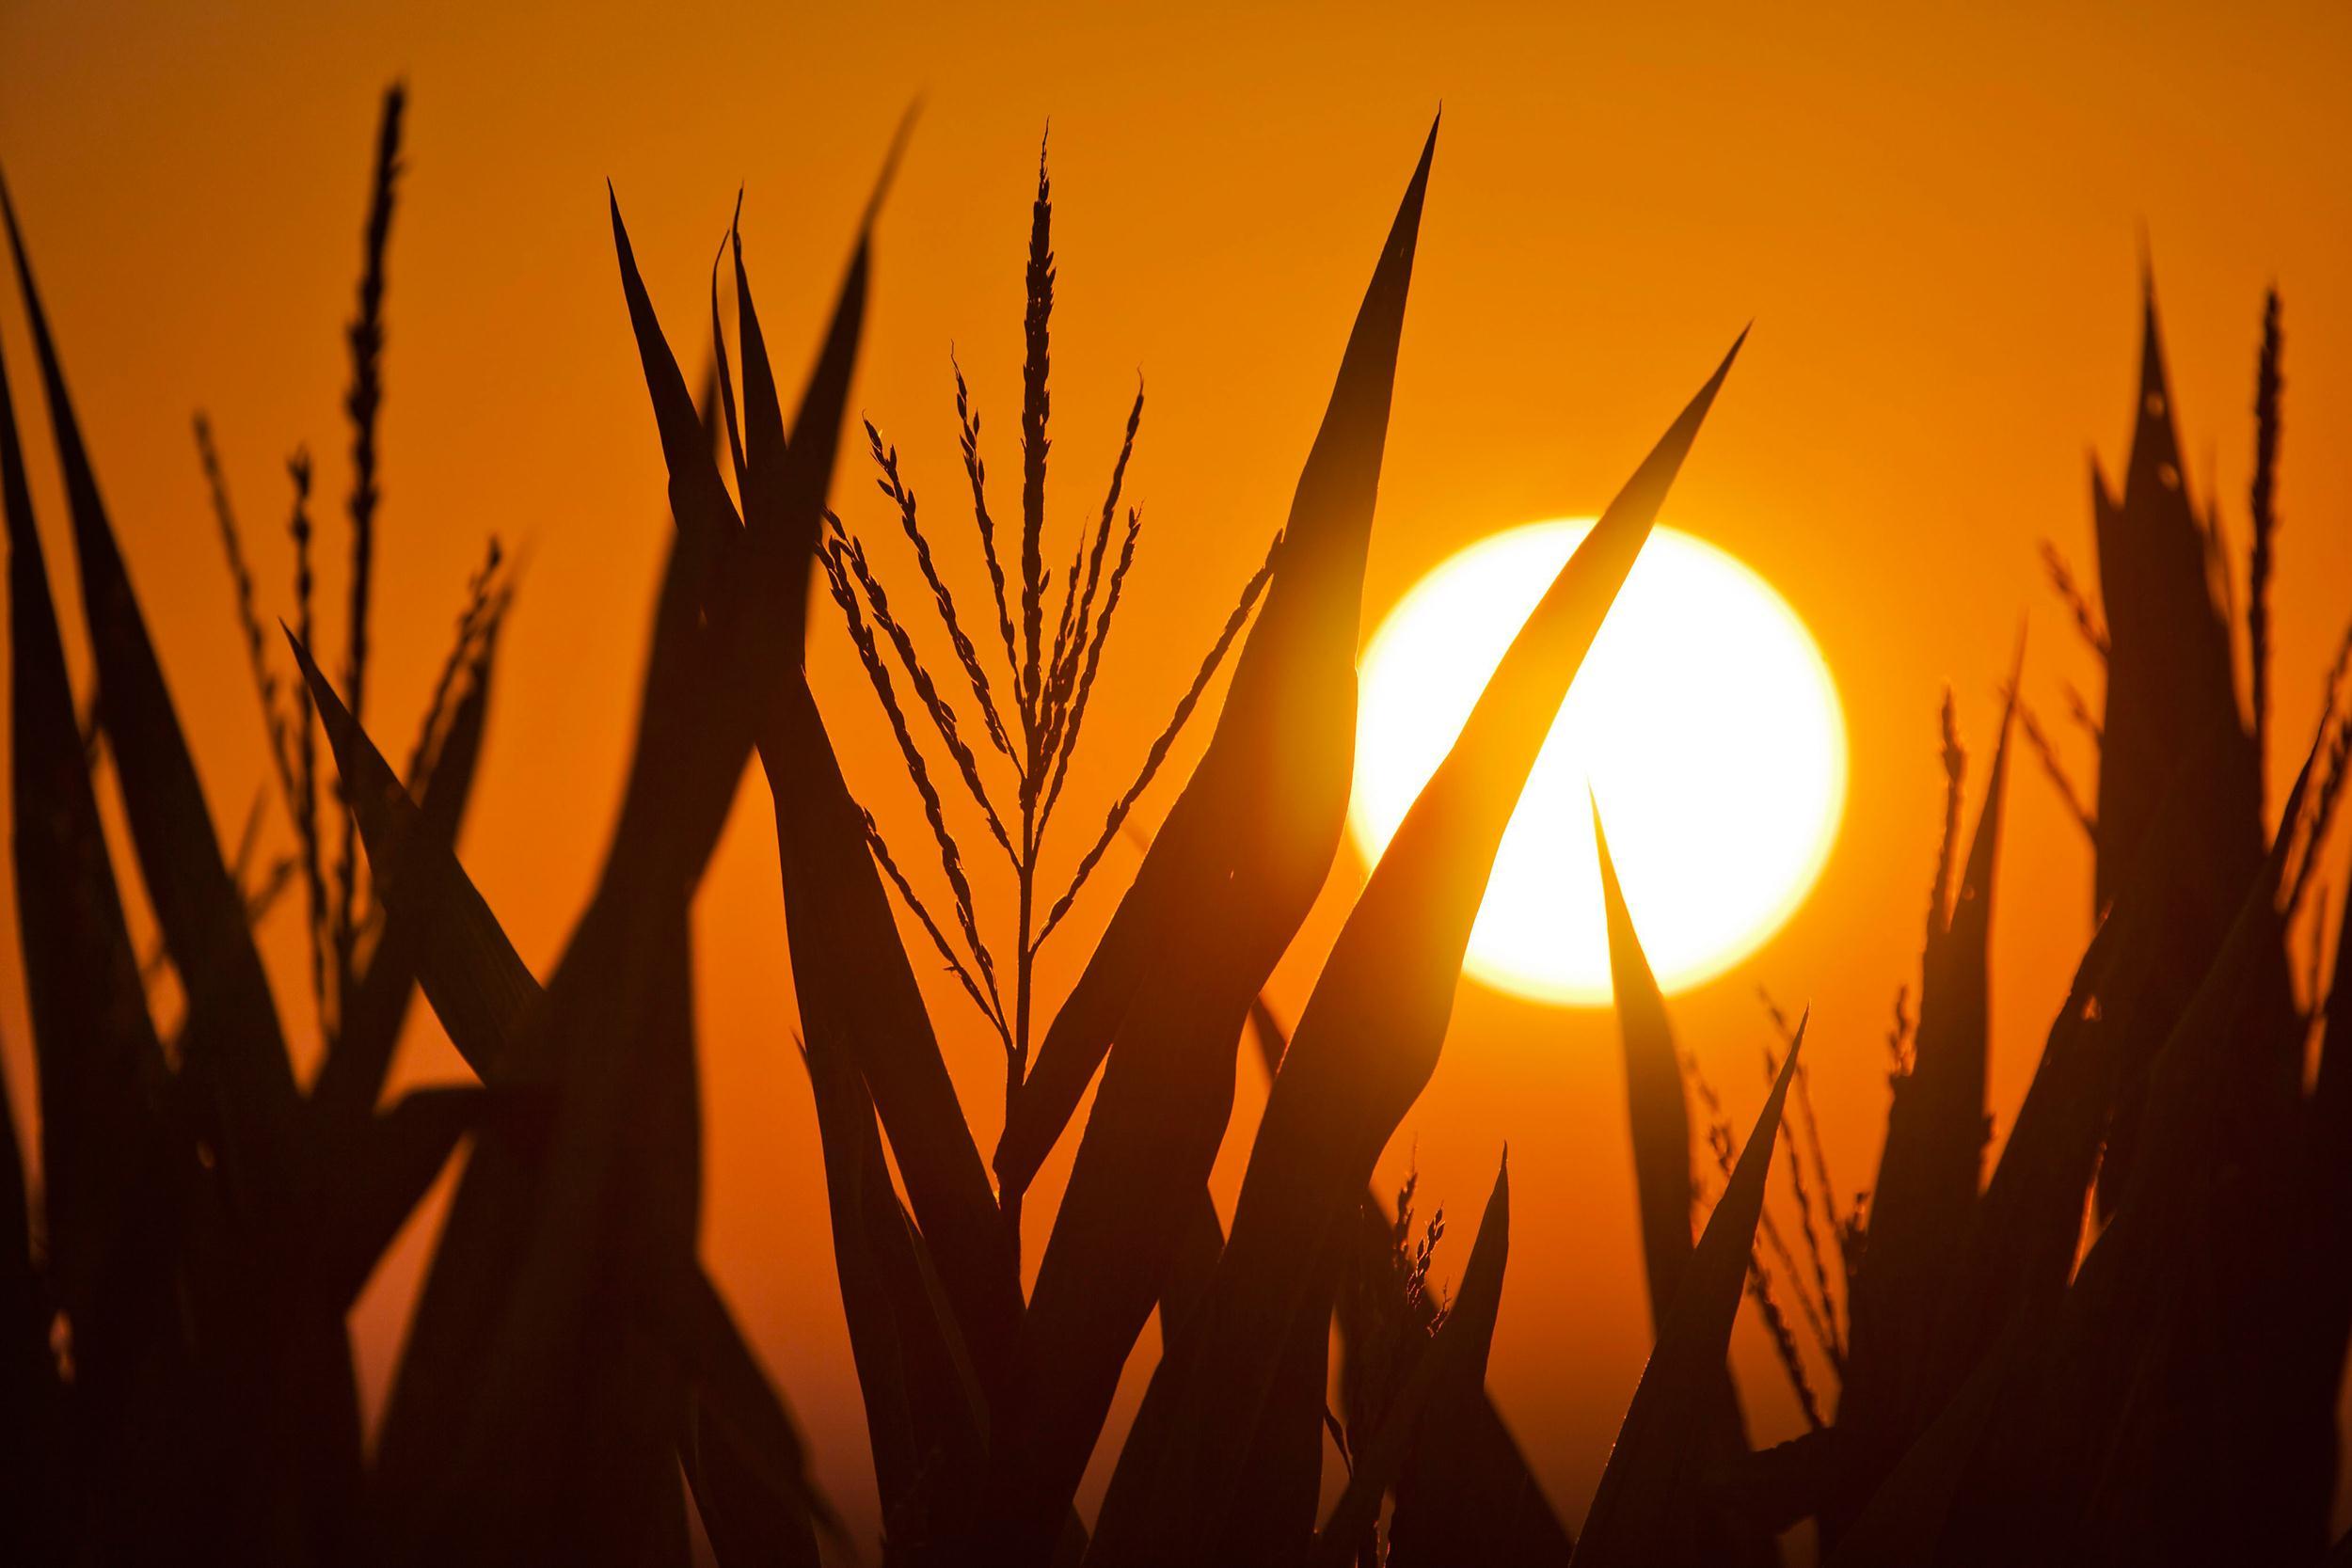 Image: The sun rises behind corn stalks.